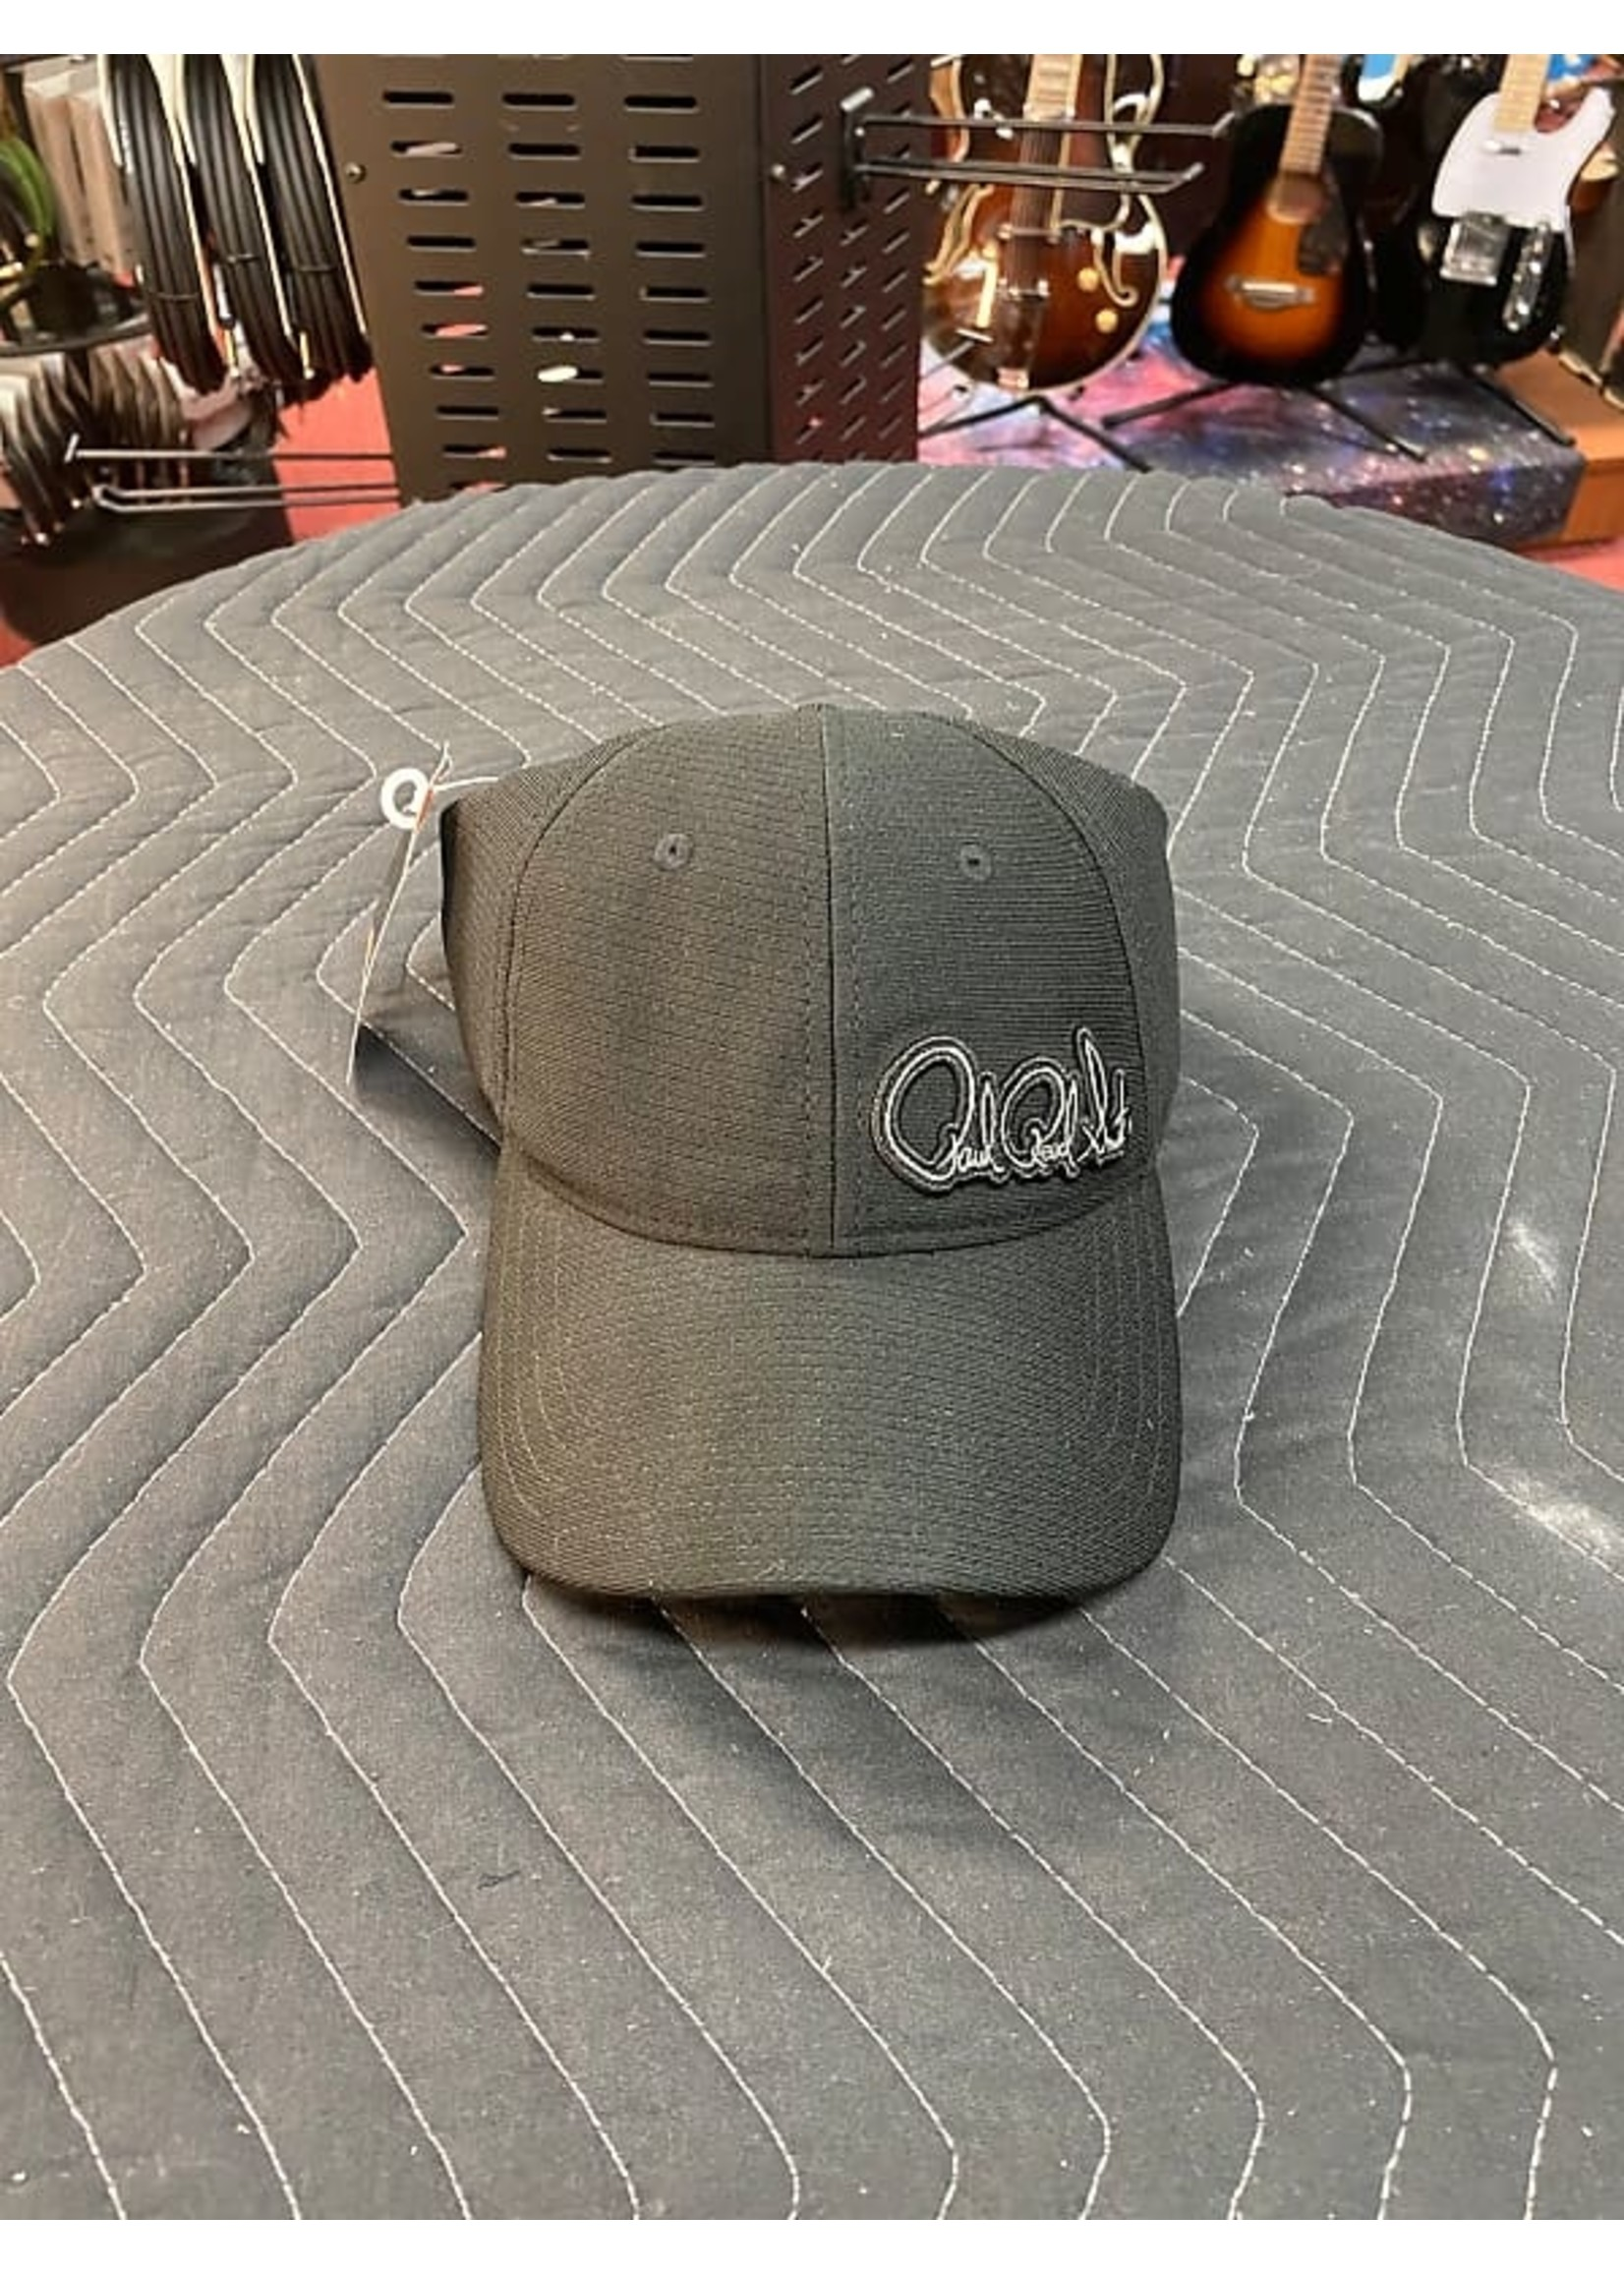 Paul Reed Smith PRS Blackout Baseball Hat